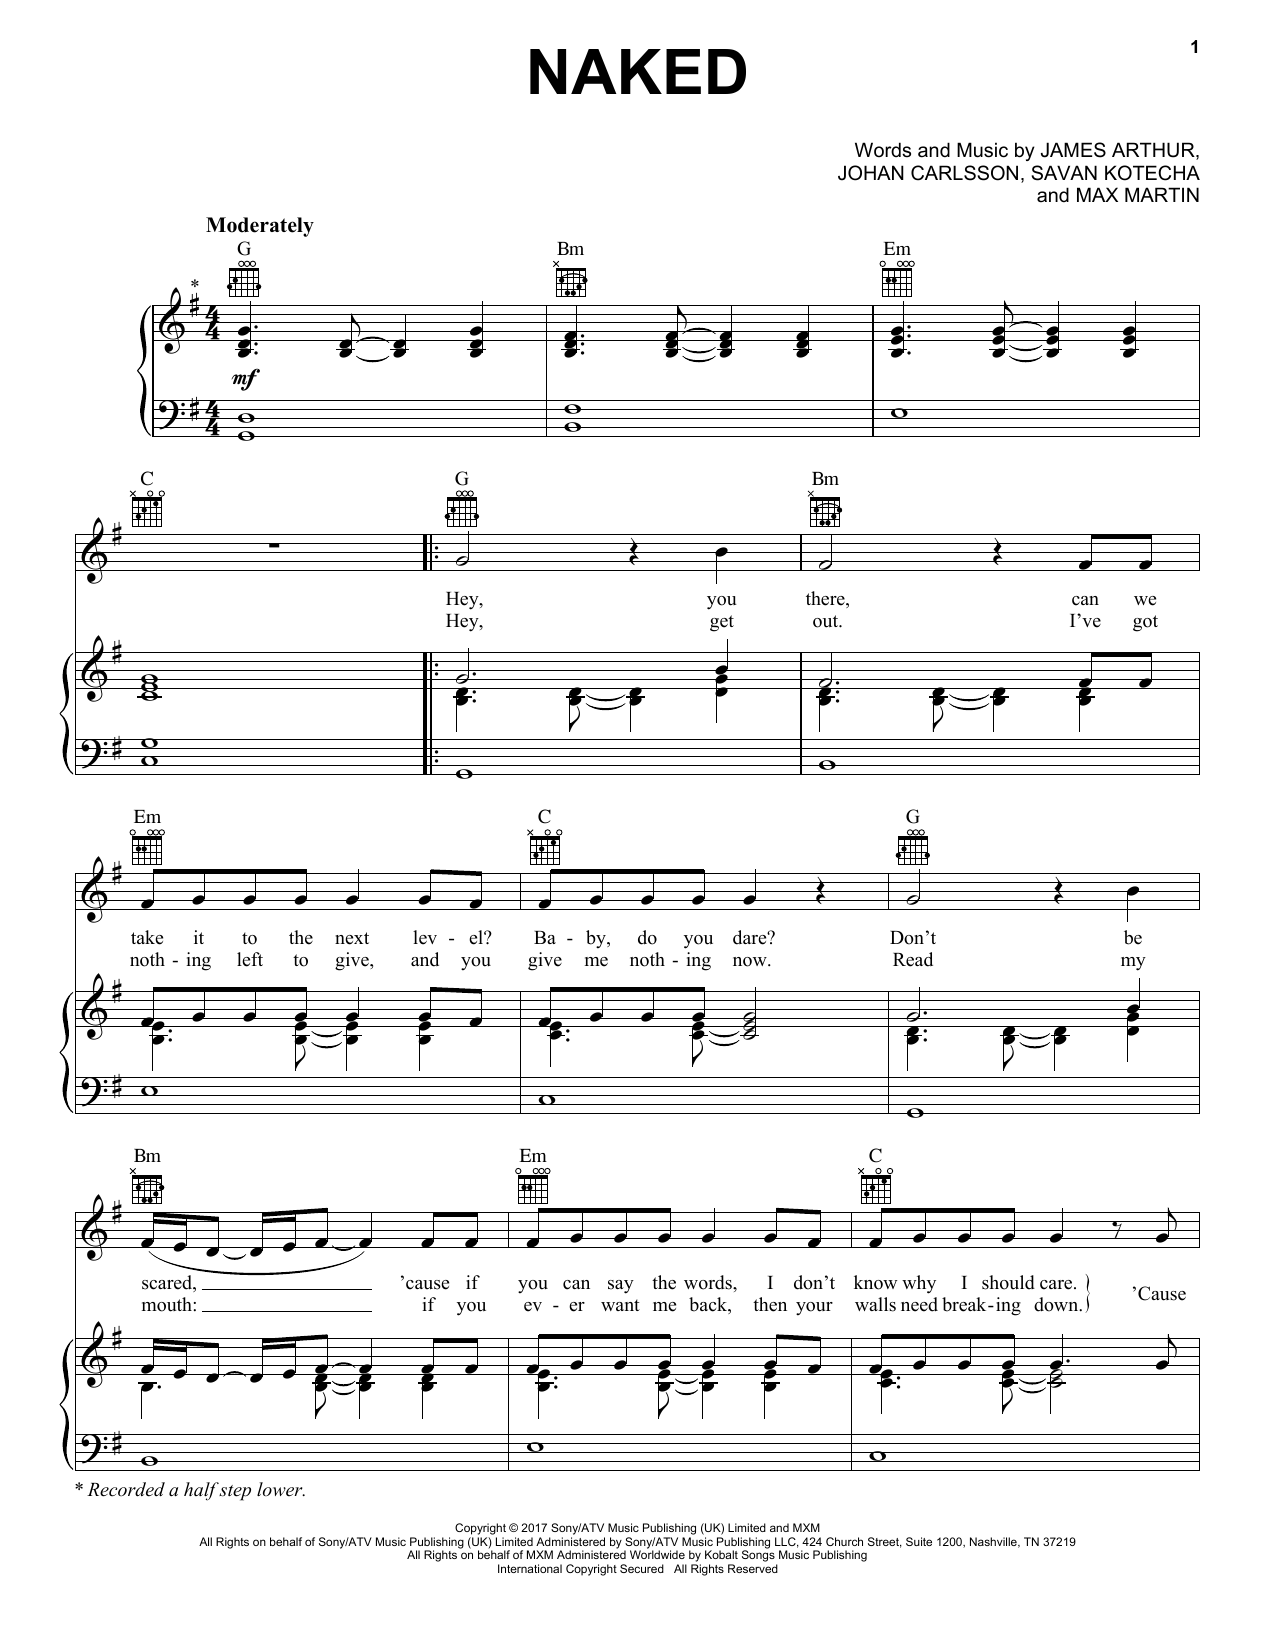 James Arthur Naked Sheet Music Notes Chords Printable Pop Piano